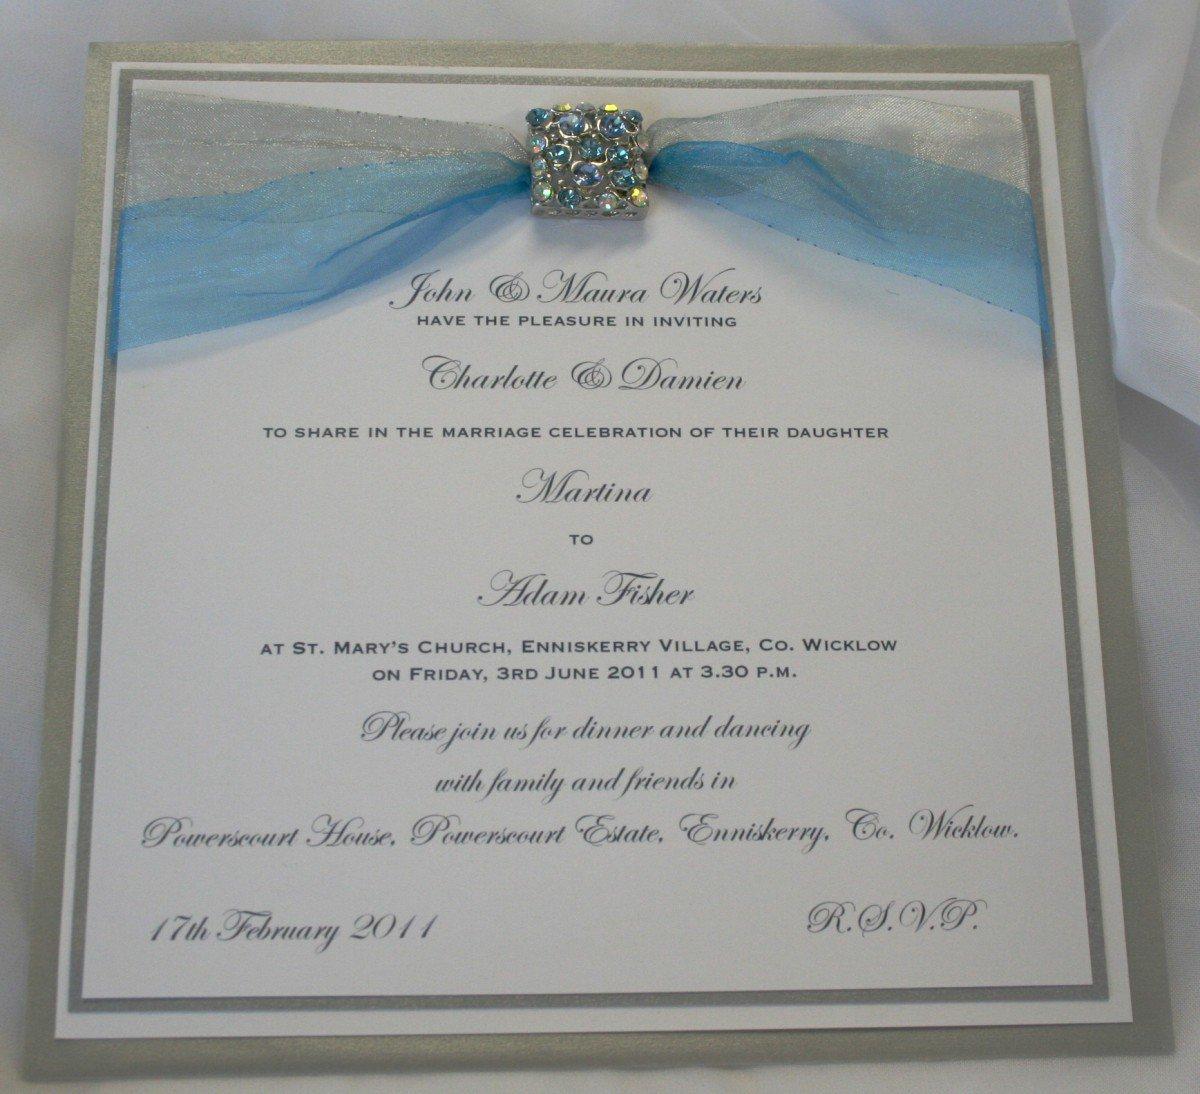 Free Wedding Invitation Downloads: Download Printable Wedding Invitation Templates